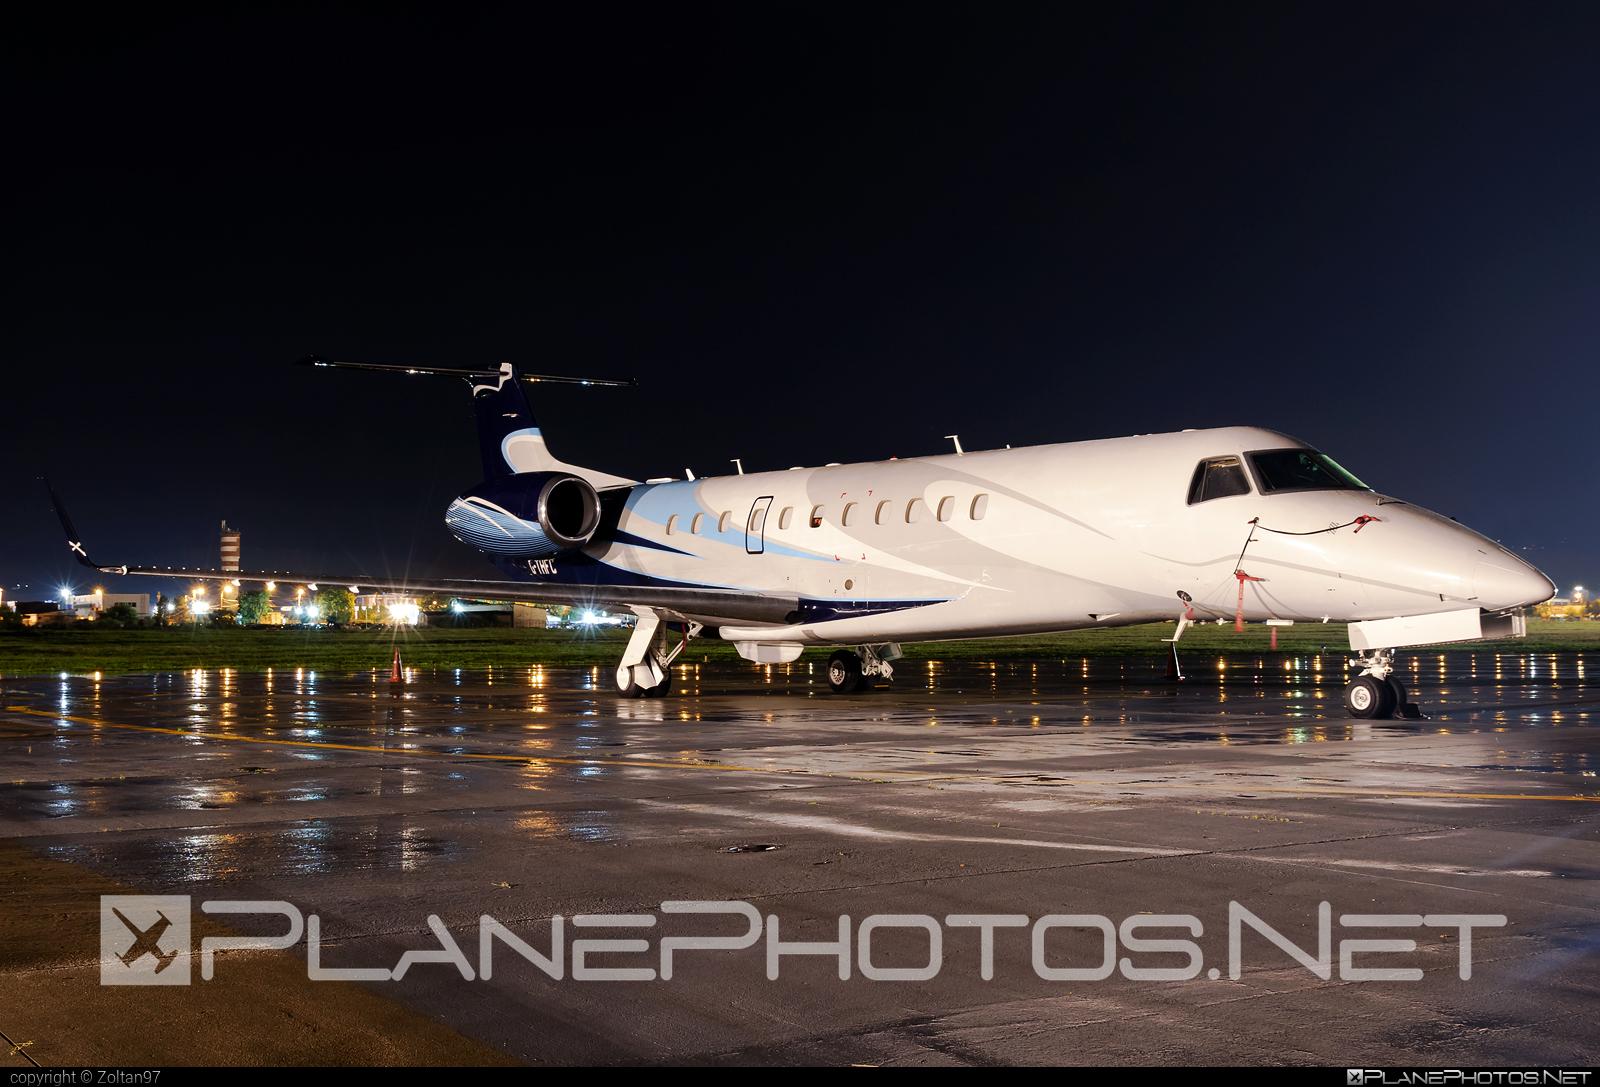 Embraer ERJ-135BJ Legacy 600 - G-THFC operated by London Executive Aviation #embraer #embraer135 #embraerlegacy #erj135 #erj135bj #legacy600